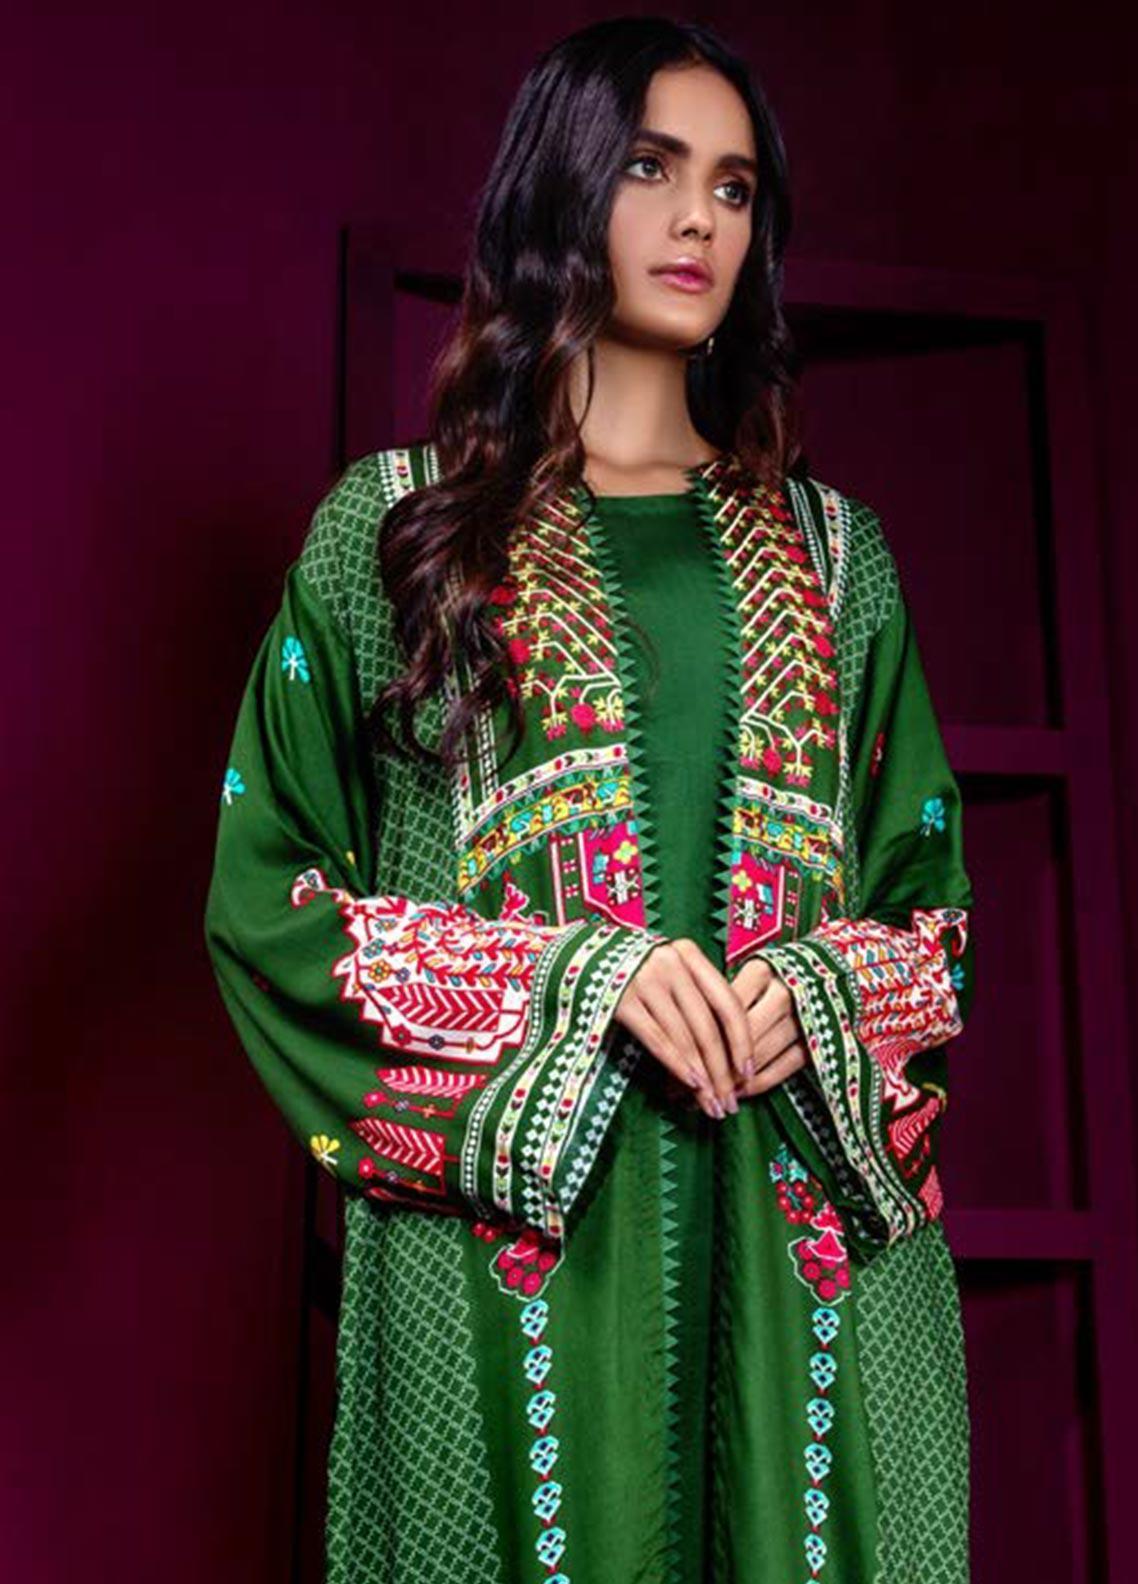 Orient Textile Embroidered Cottel Linen Unstitched Kurties OT19W 177 CARPET STORY A - Winter Collection